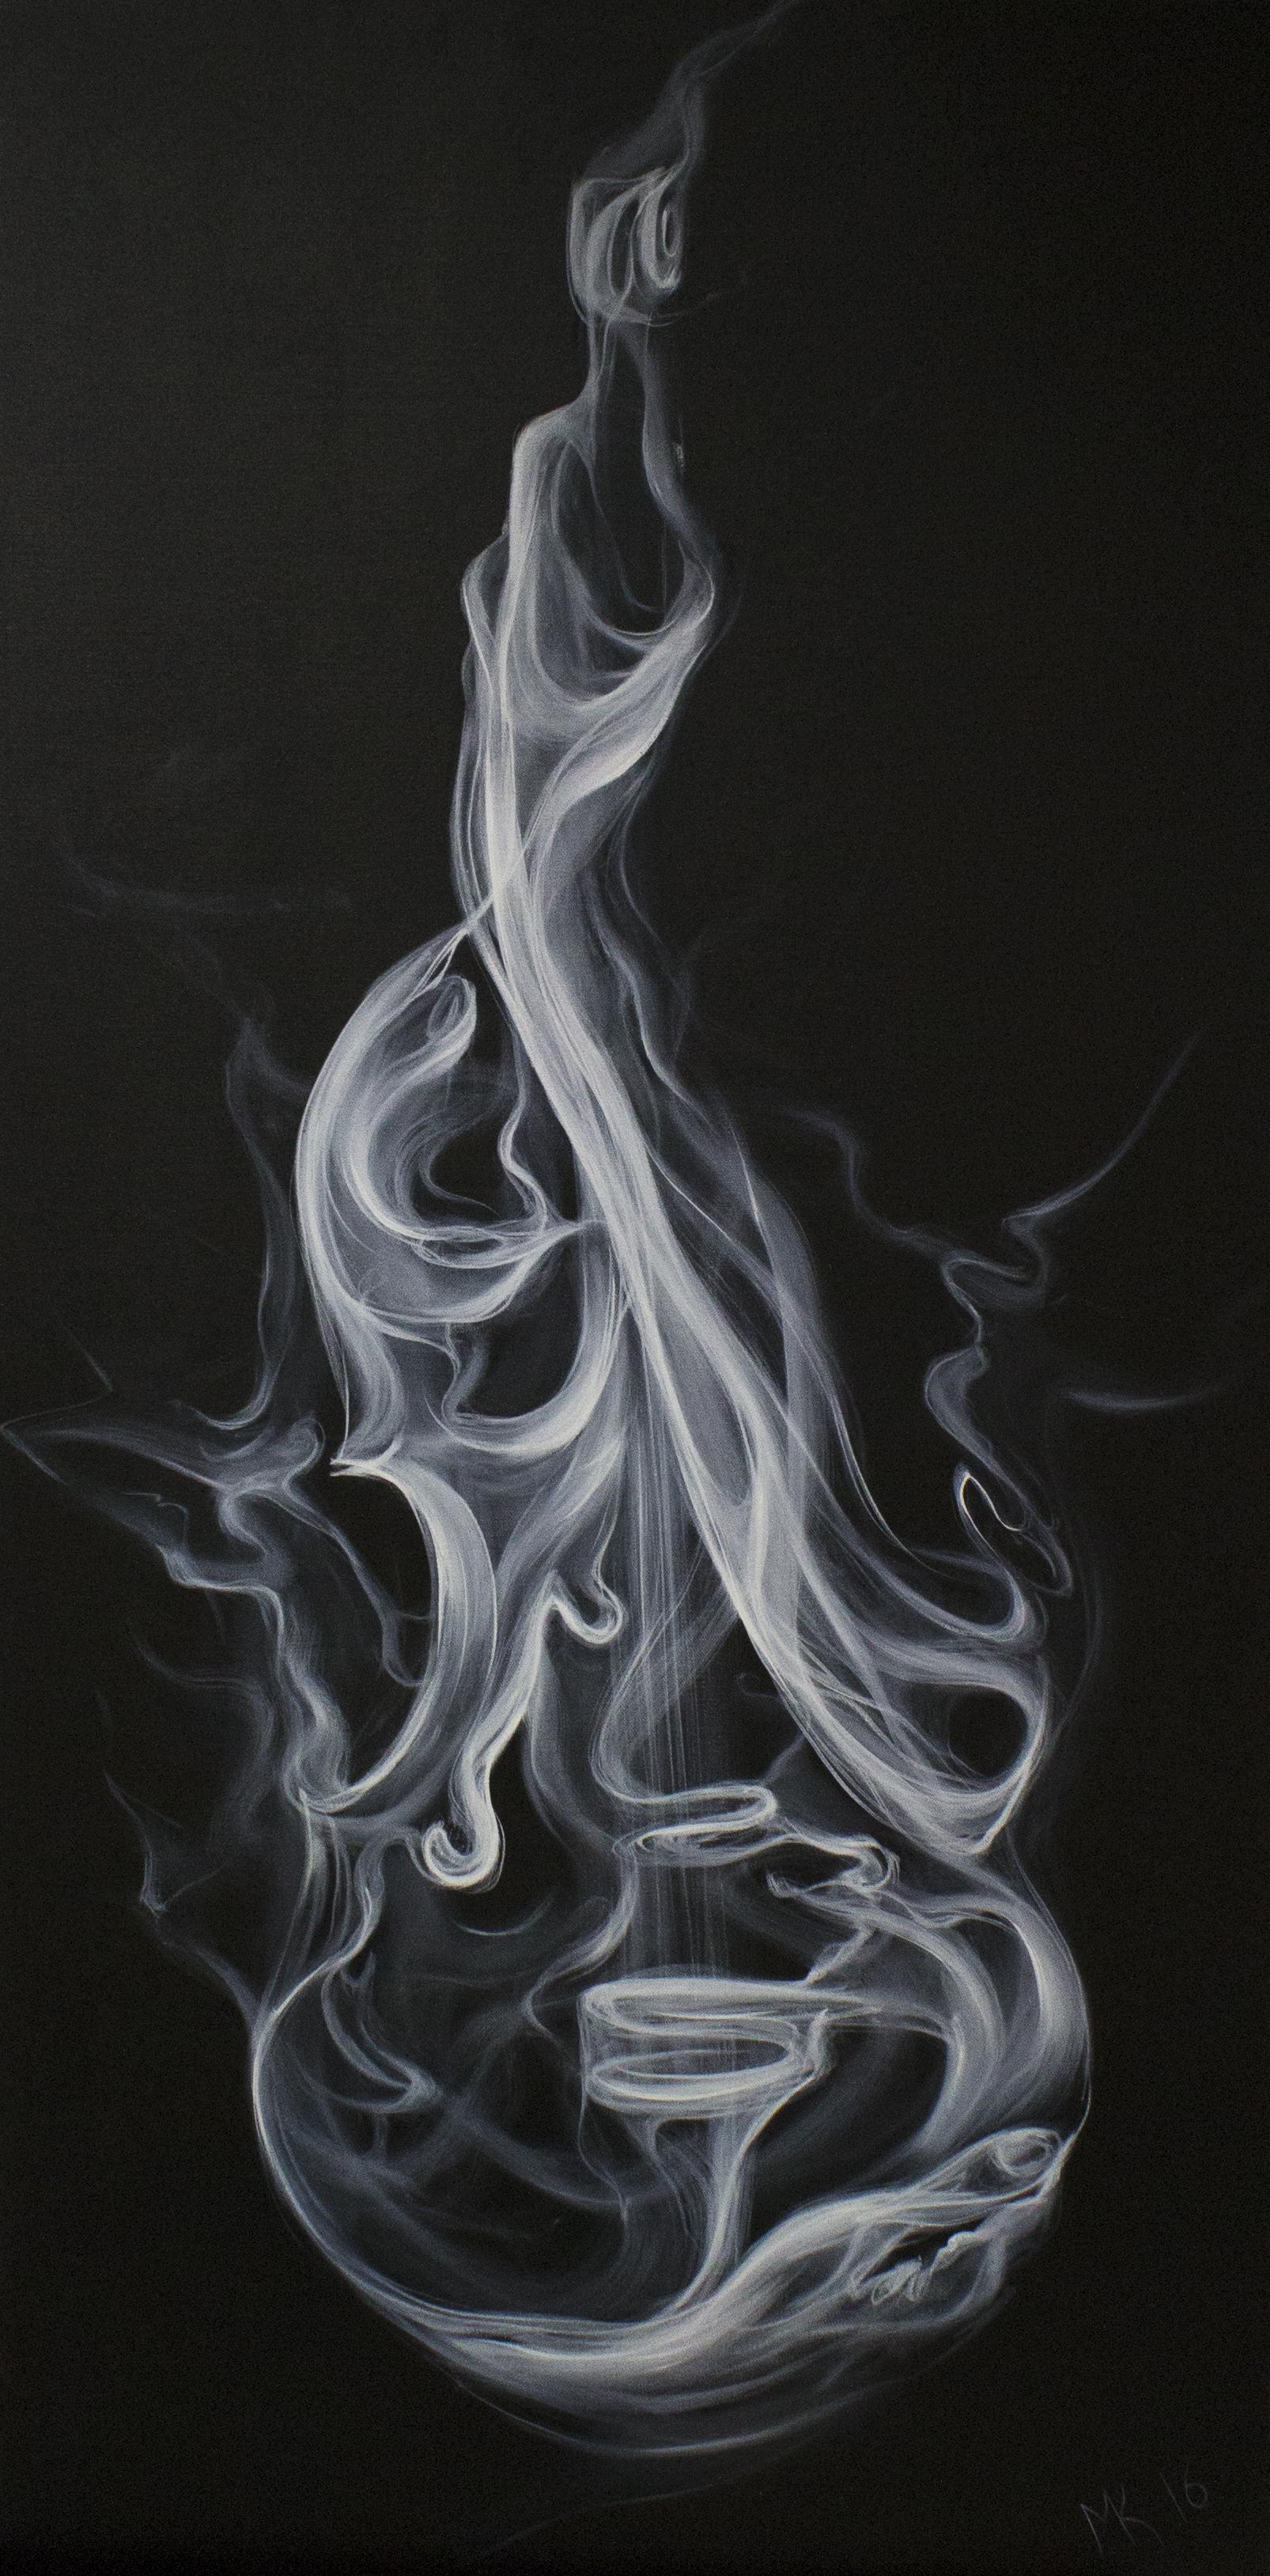 Violin#2 - Smoke- Mher Khachatryan